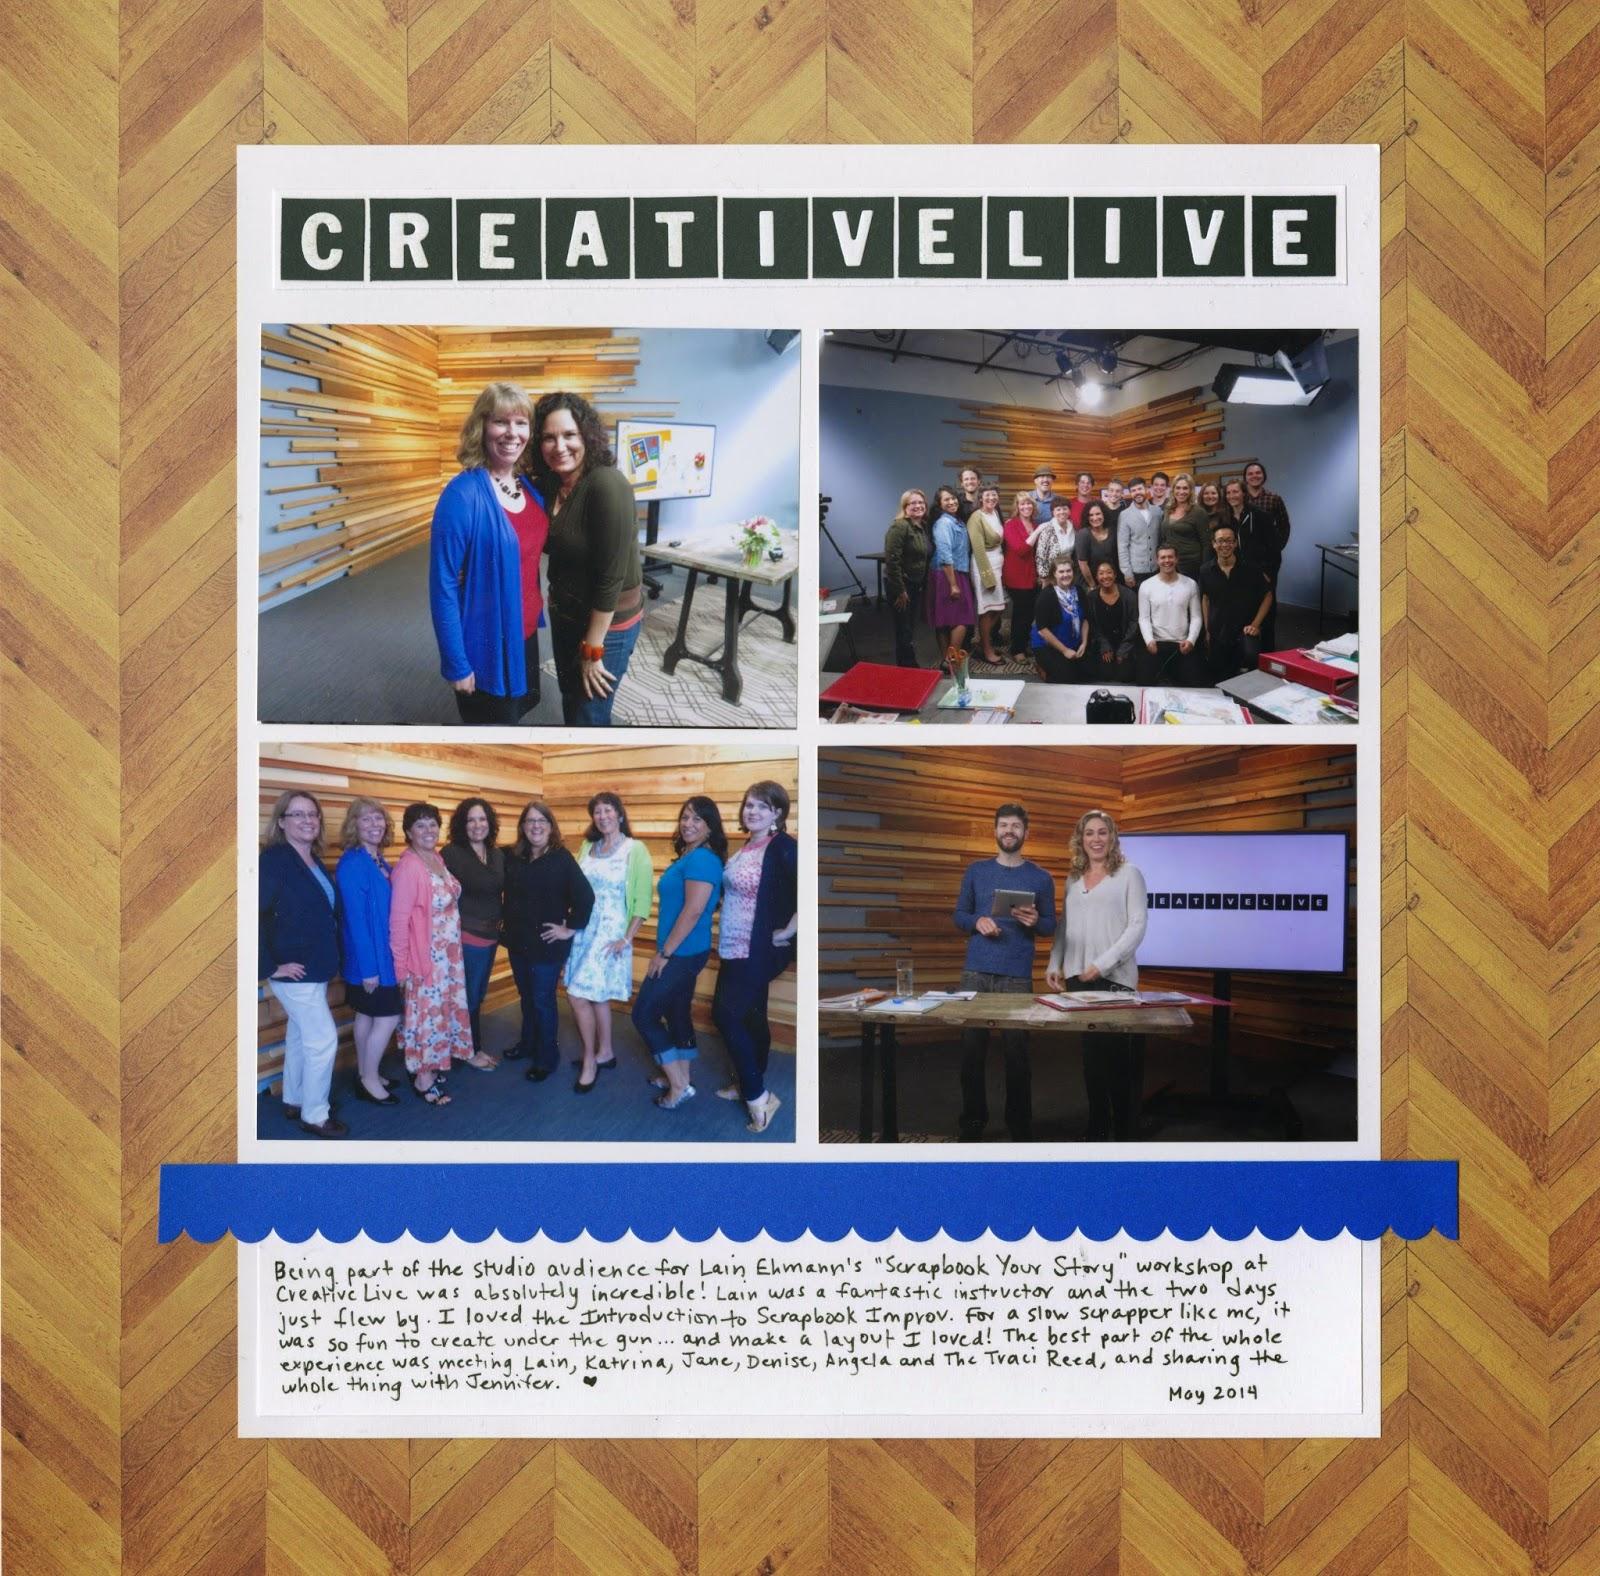 Cindy Derosier My Creative Life Creativelive Scrapped